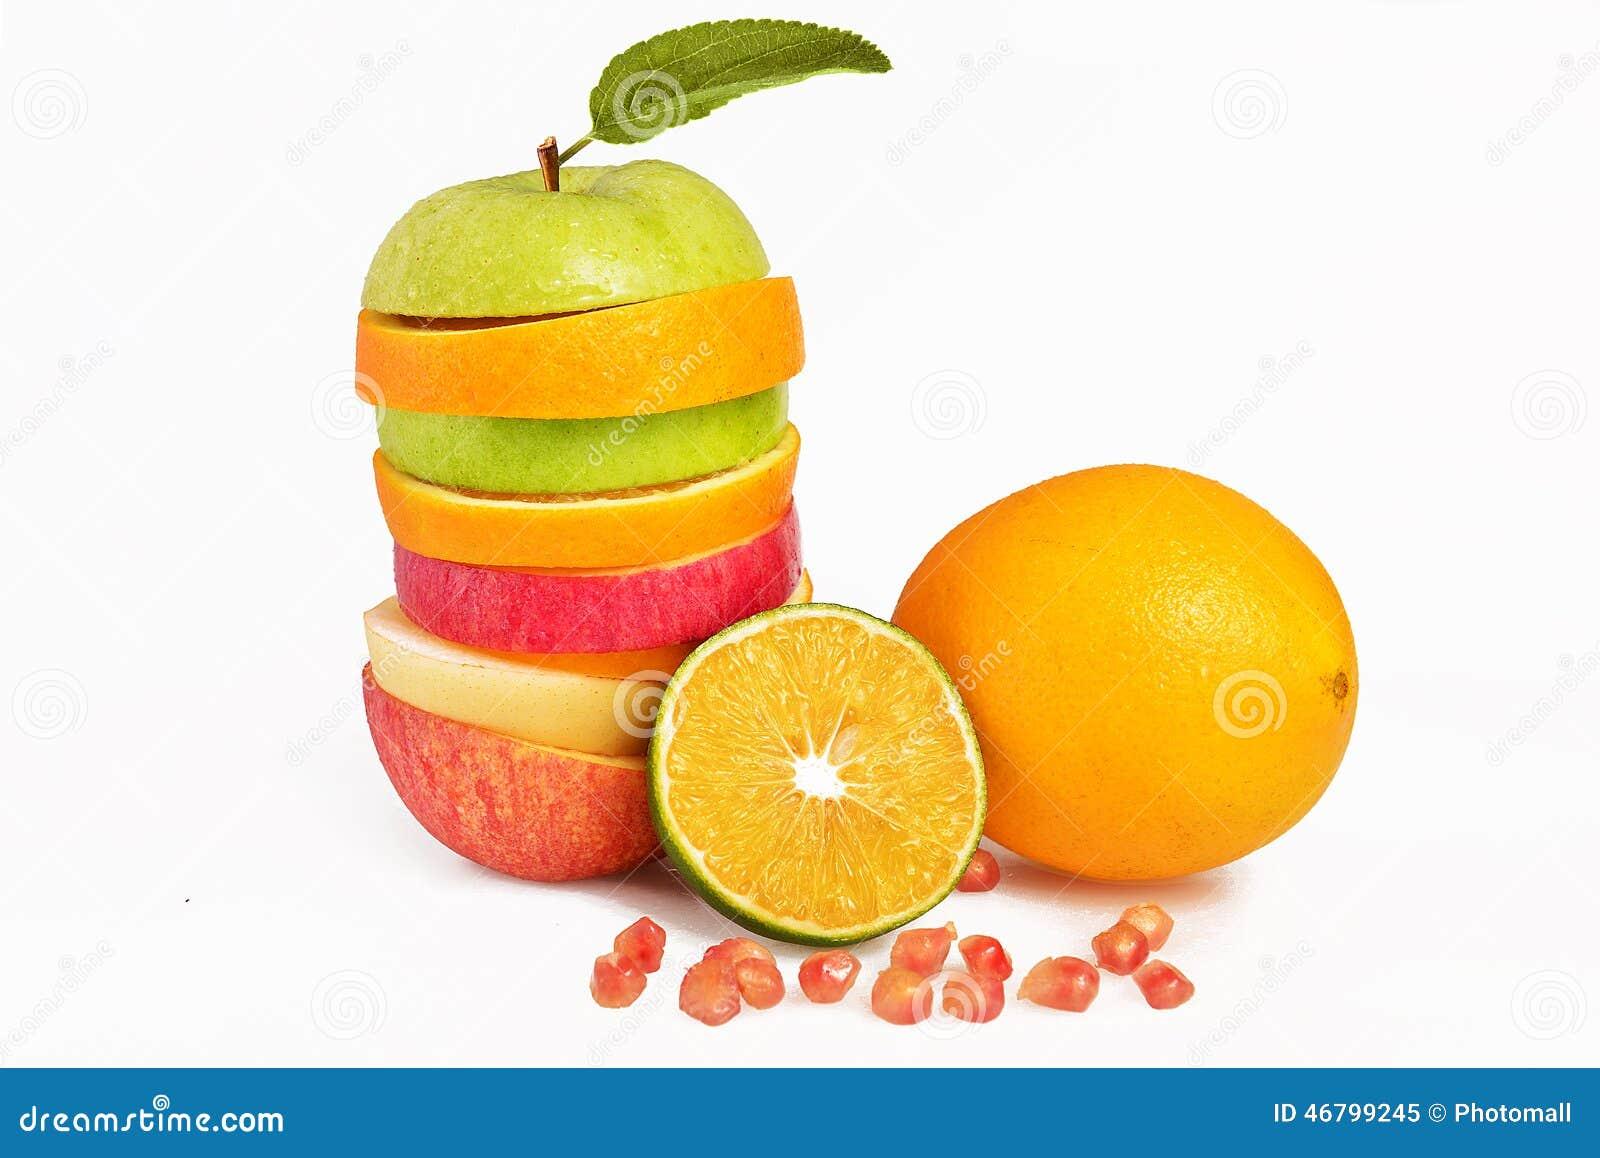 Mixed Fruit Slices,Fresh Fruit Salad,Apple Pear Orange And ...